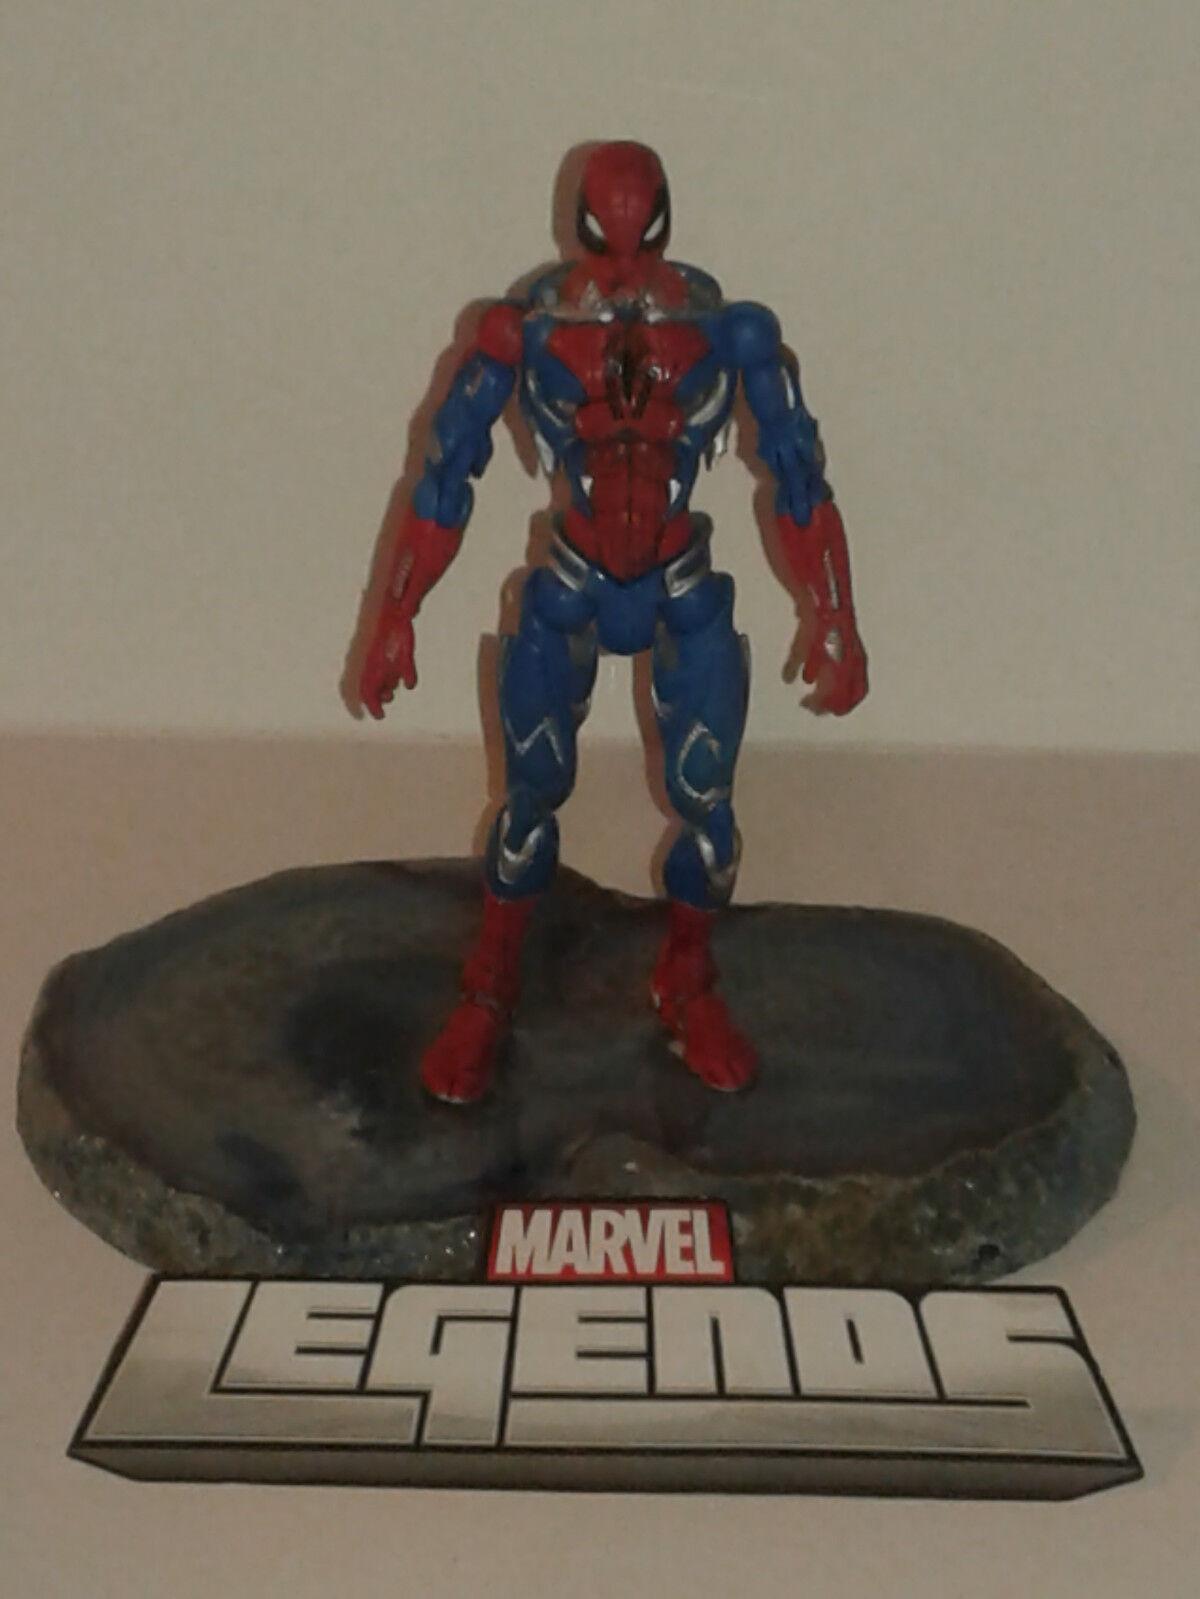 Marvel Legends 350 - CYBER SPIDER-MAN - Loose Figure RARE UNRELEASED PROTOTYPE